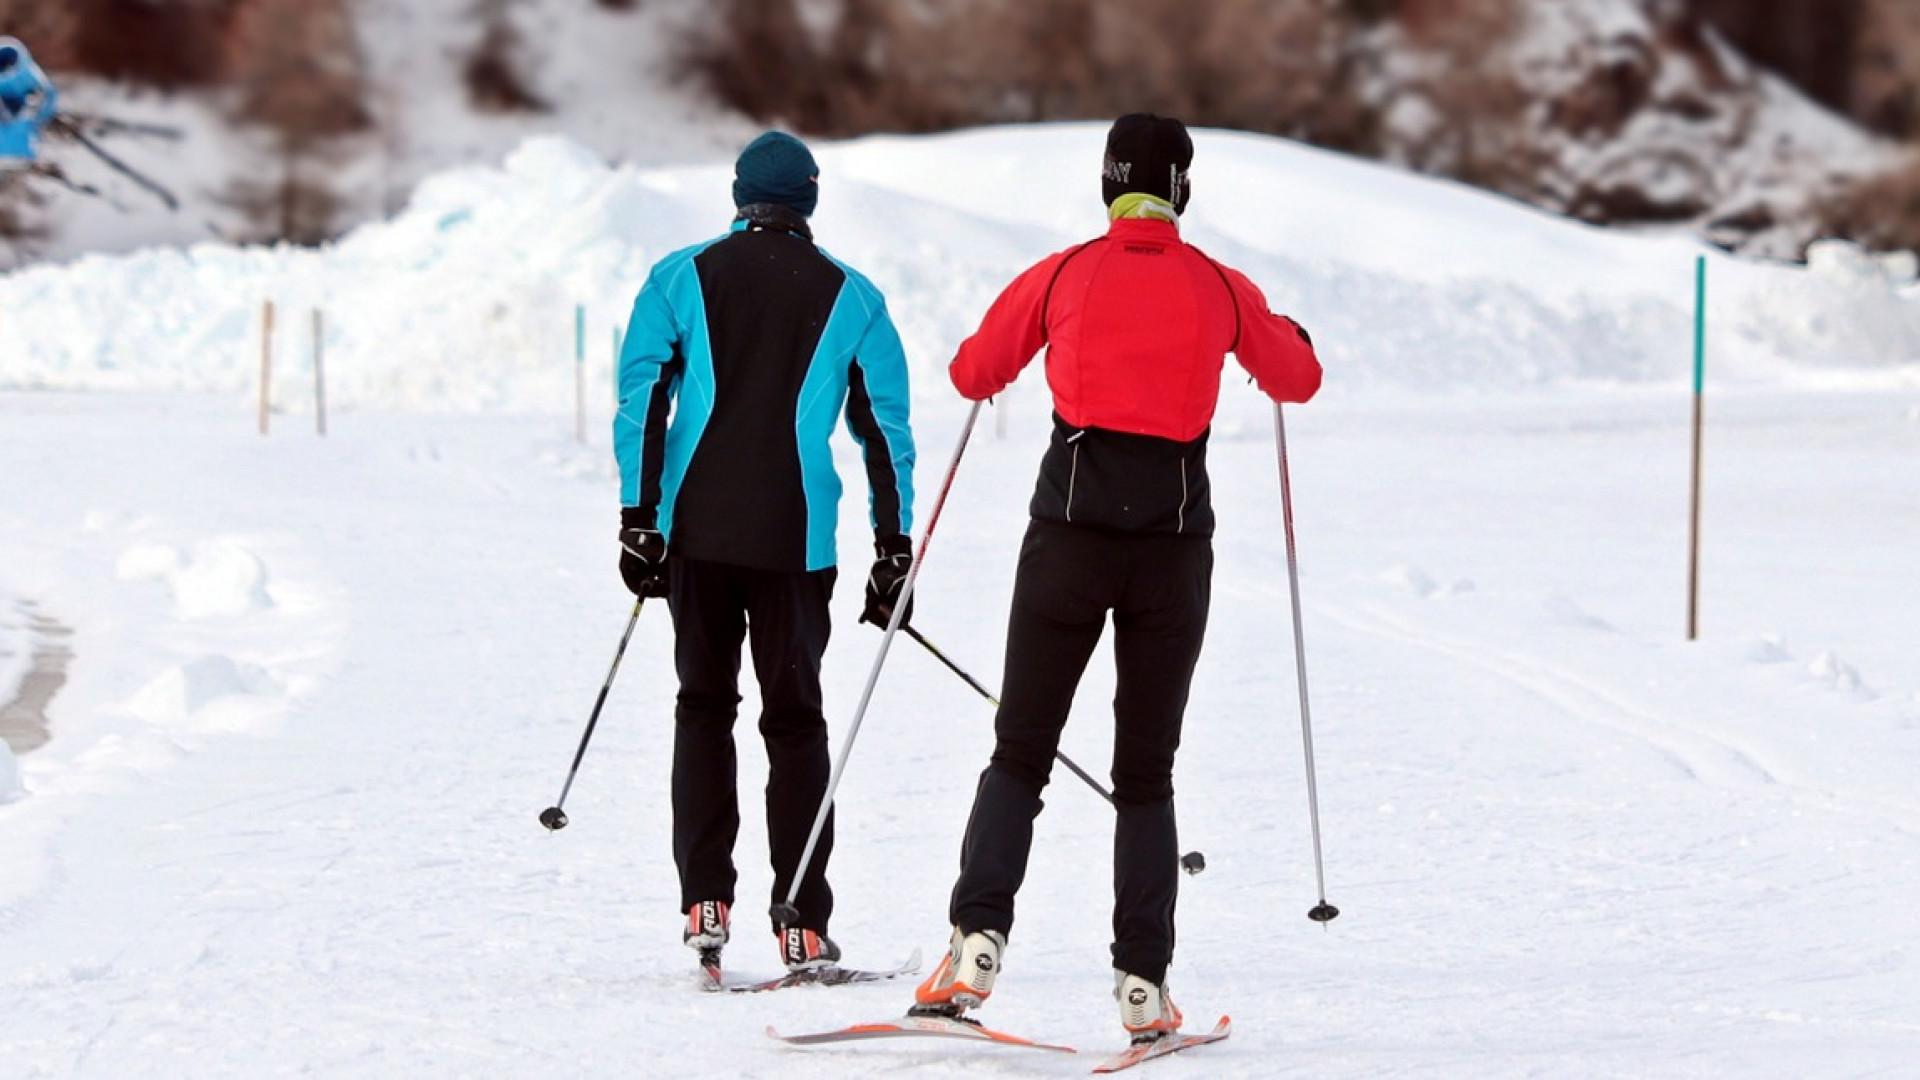 e5b40395bee27e38baf913d150c3f024 - La location de ski à Super Besse, vous allez adorer !